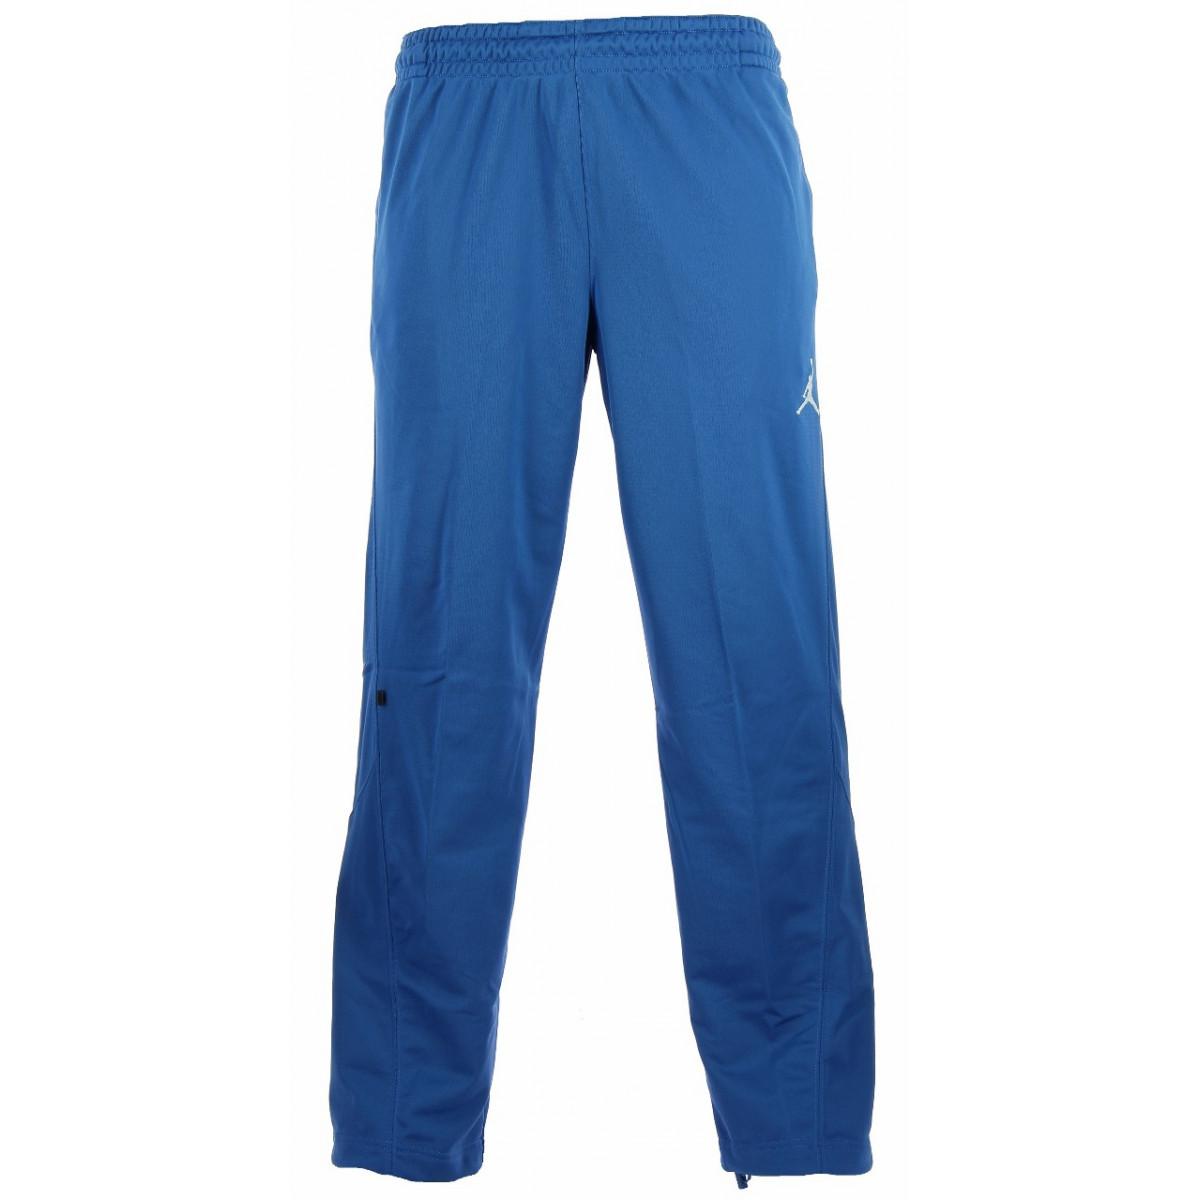 Pantalon de surv tement nike jordan fit jumpman ref 547624 434 downtownstock com - Pantalon de survetement ...